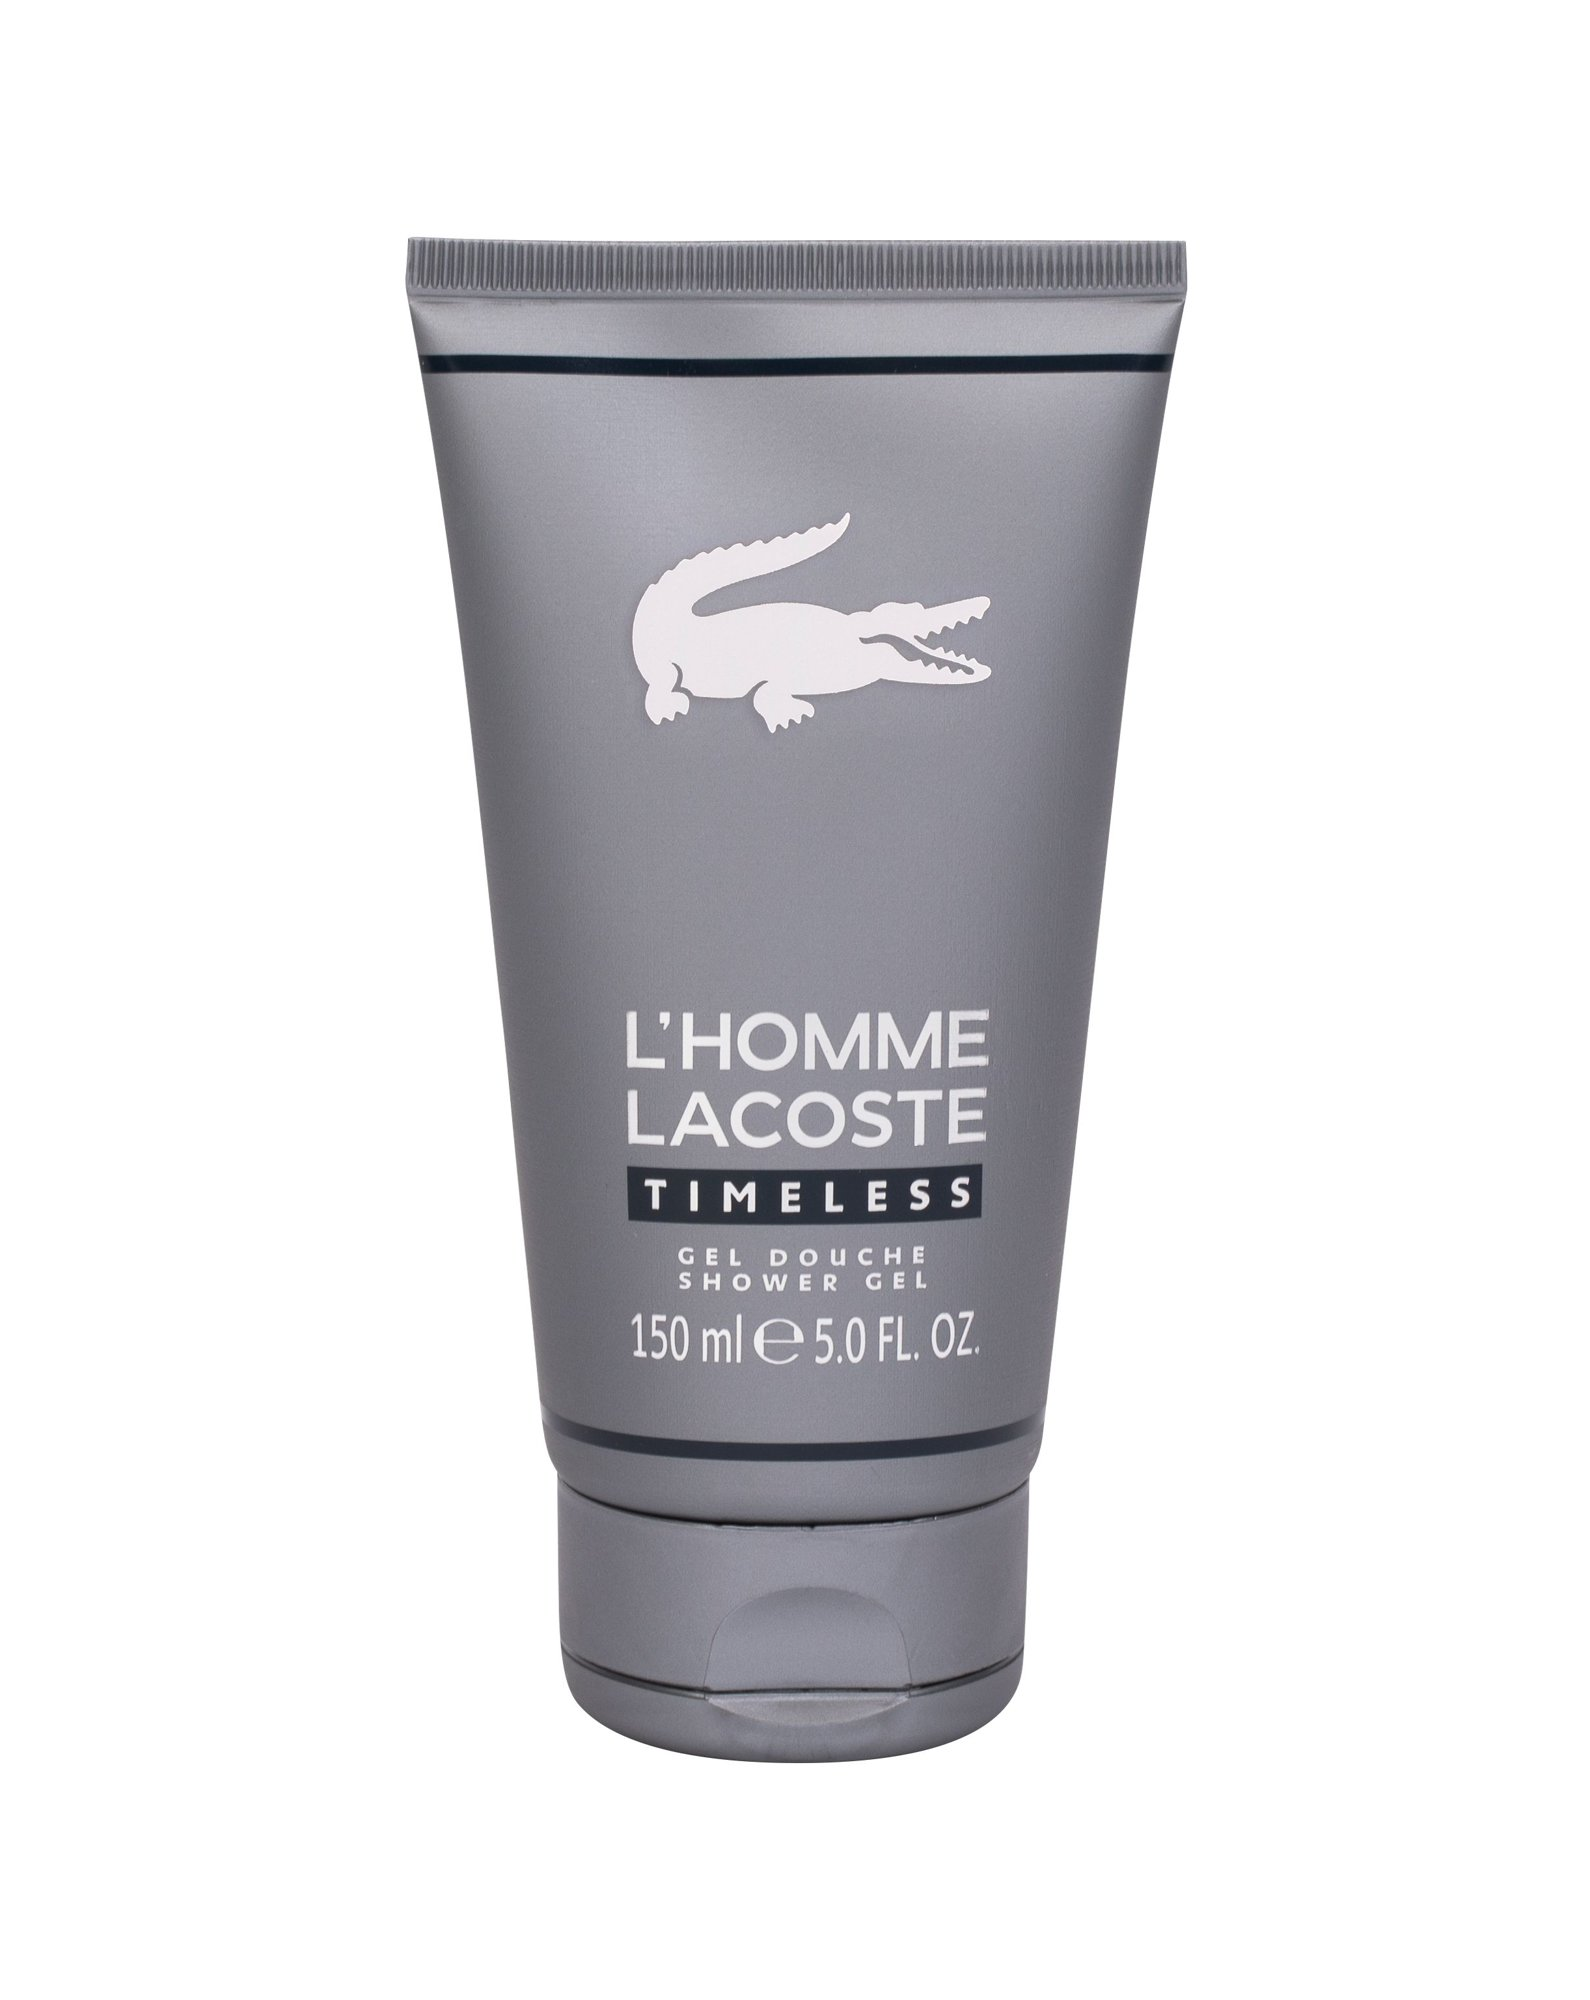 Lacoste L´Homme Lacoste Timeless, Sprchovací gél 150ml